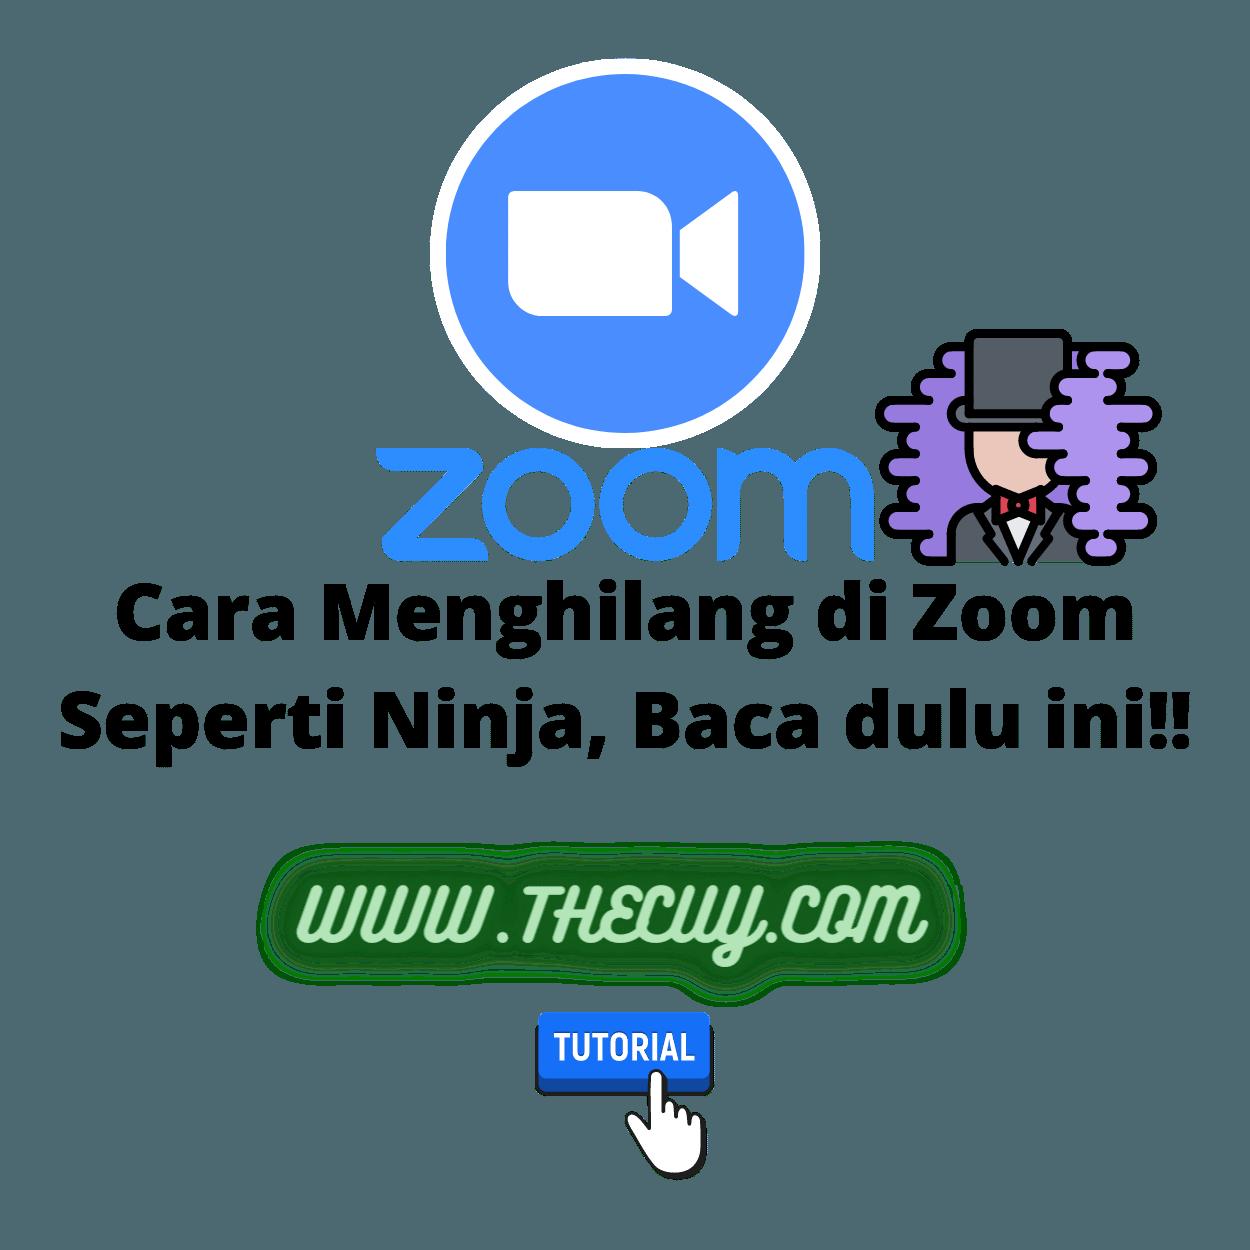 Cara Menghilang di Zoom Seperti Ninja, Baca dulu ini!!